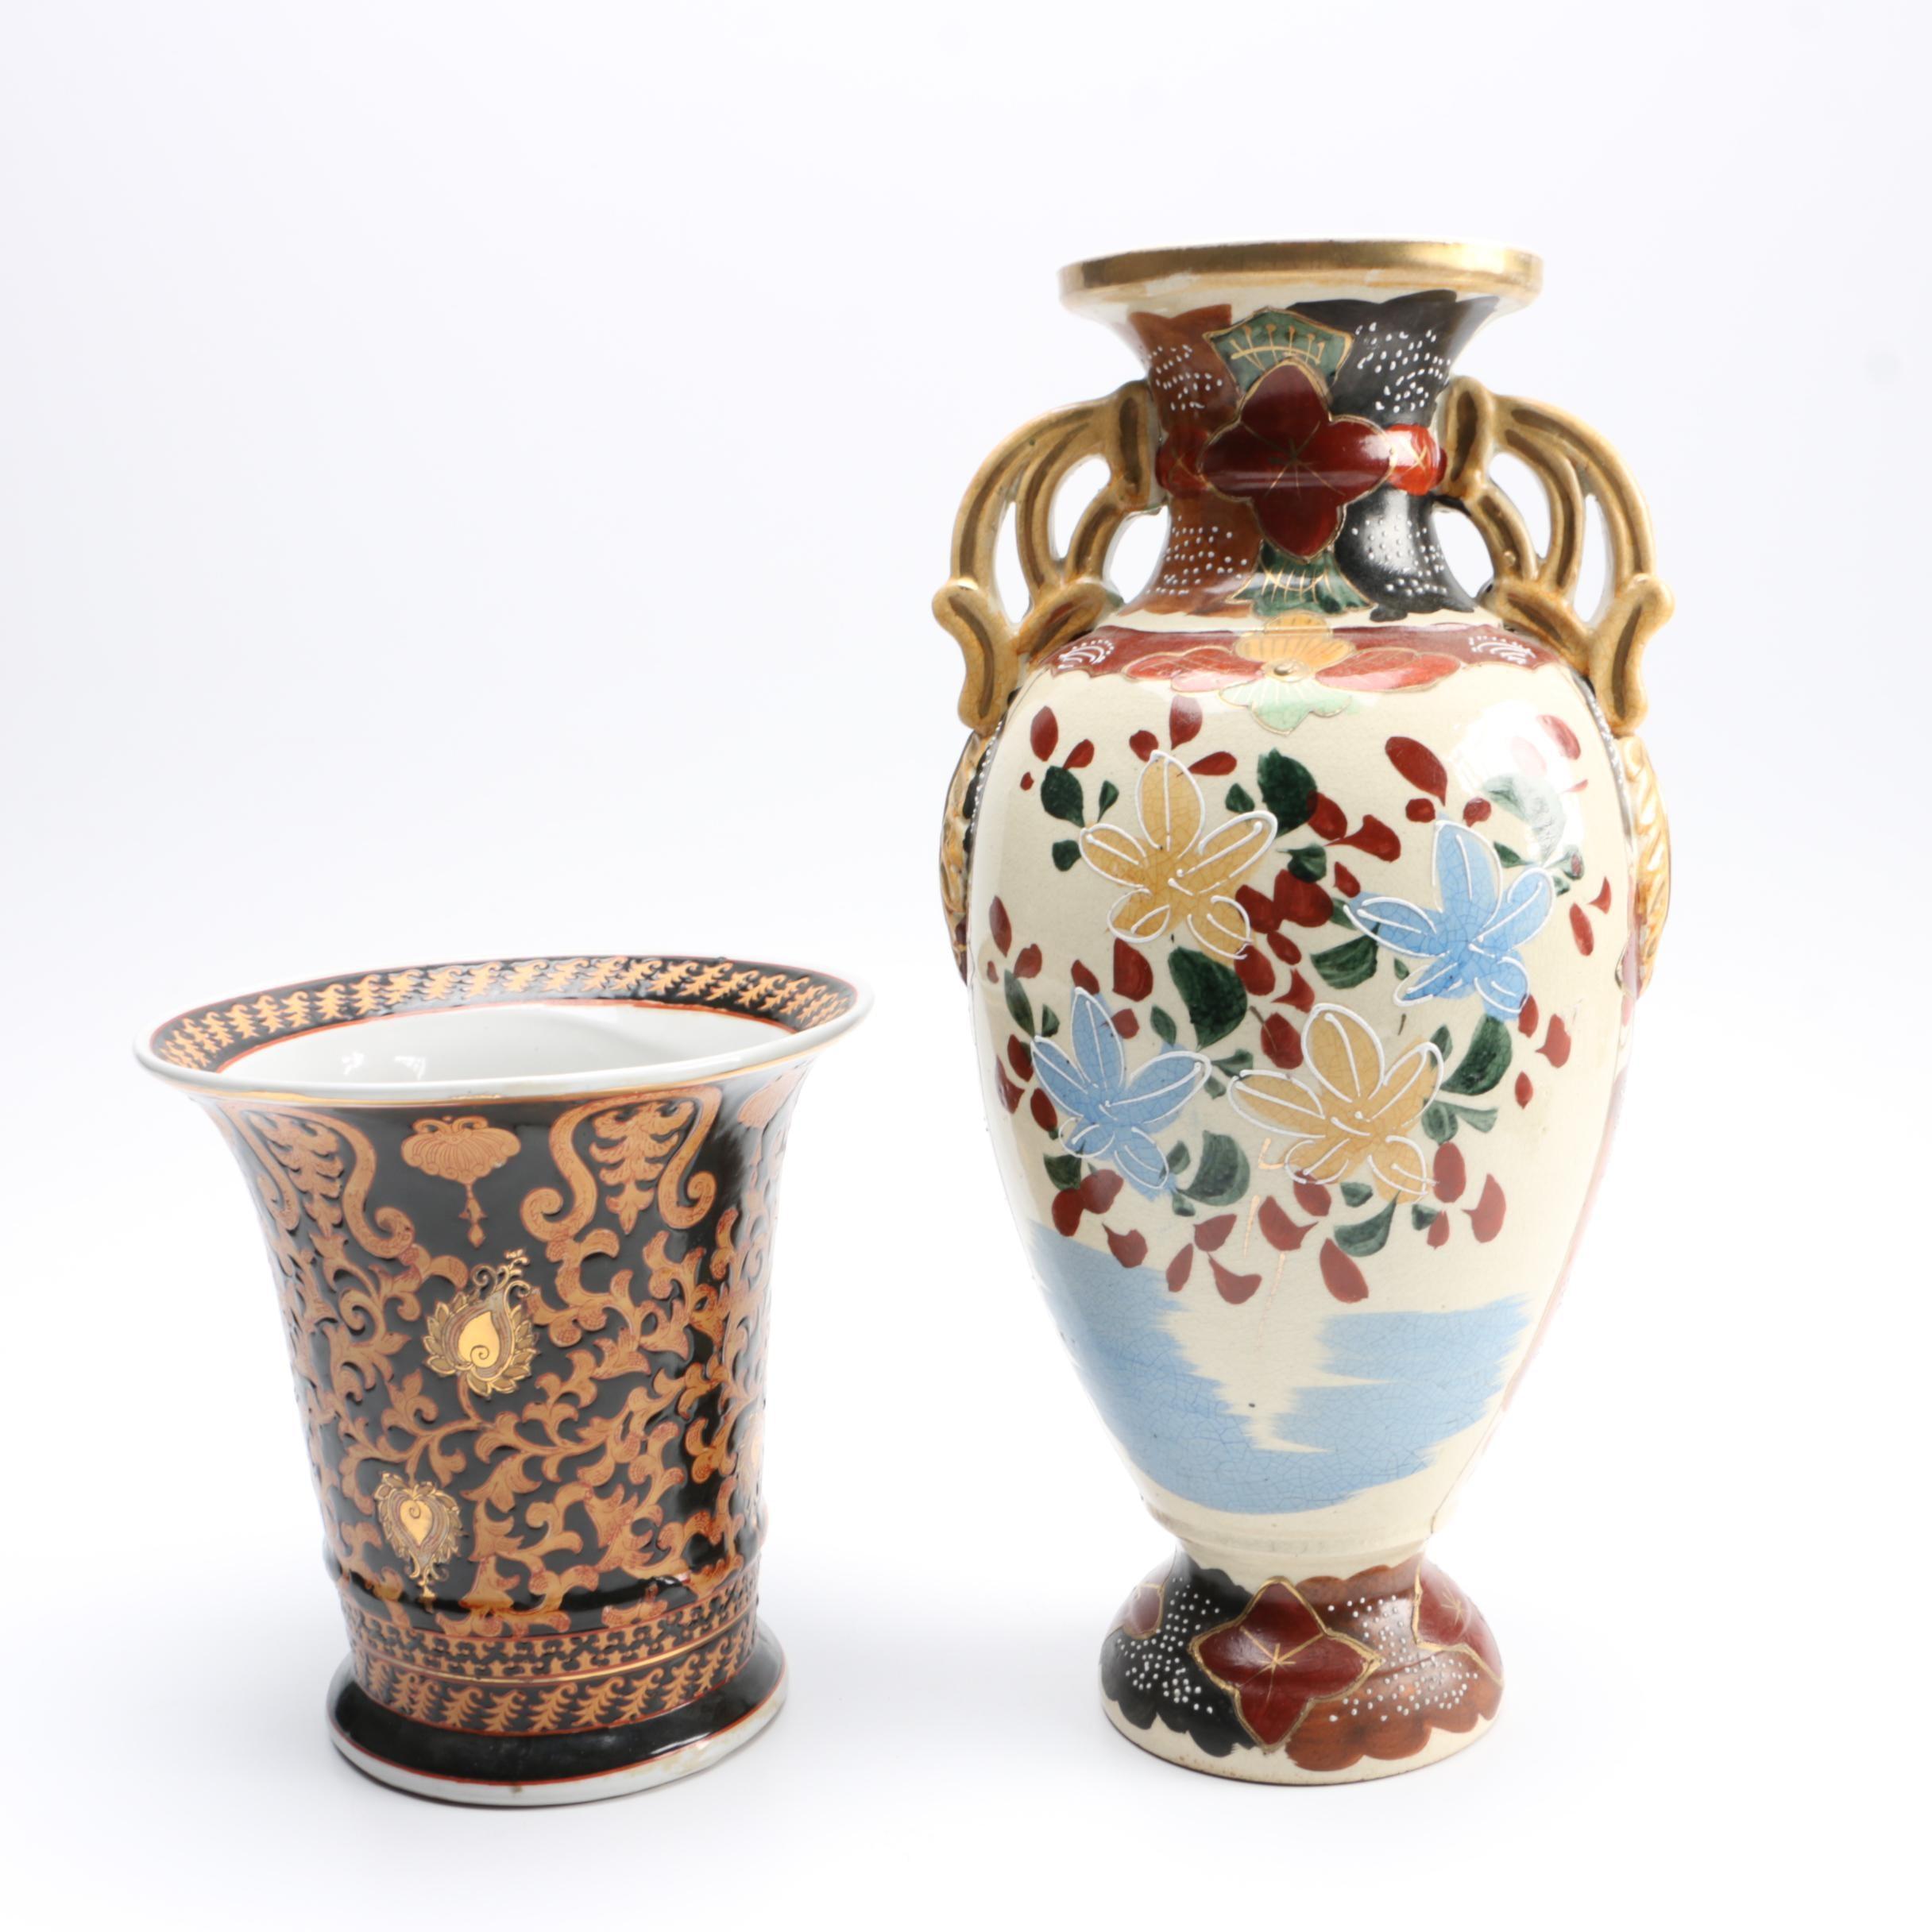 Two Asian Inspired Vases